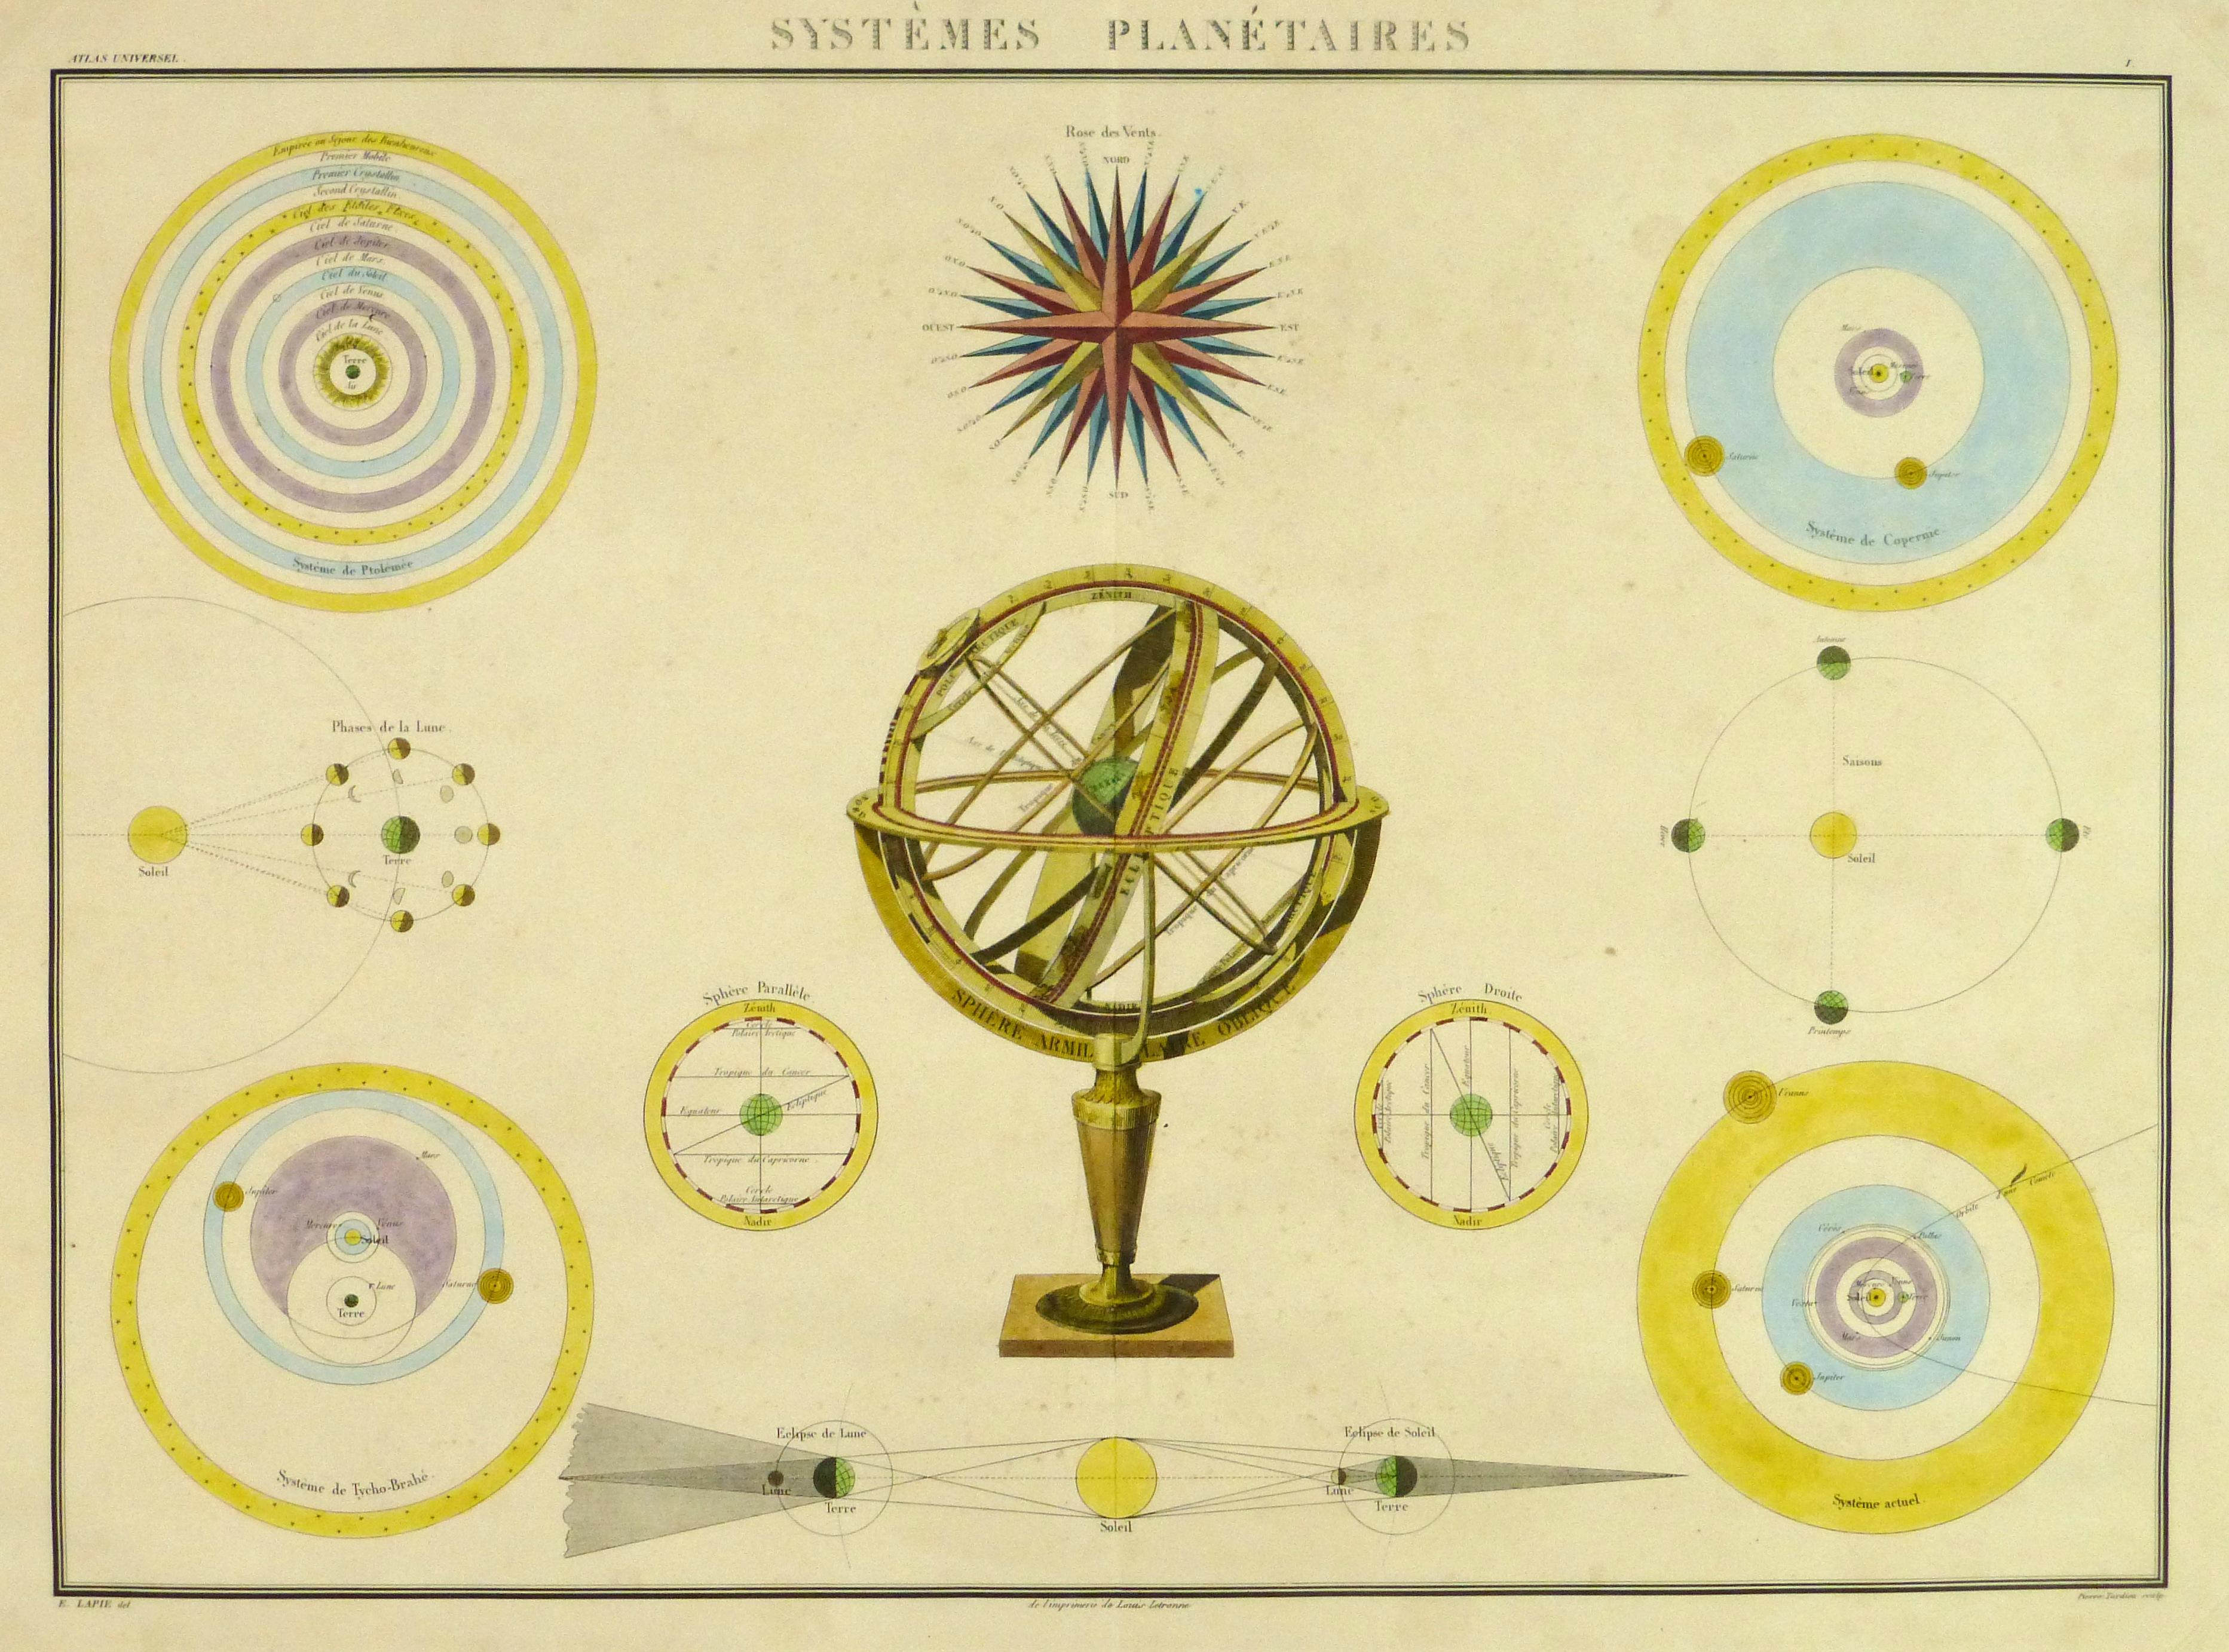 Planetary Systems Engraving, 1838-main-10369M